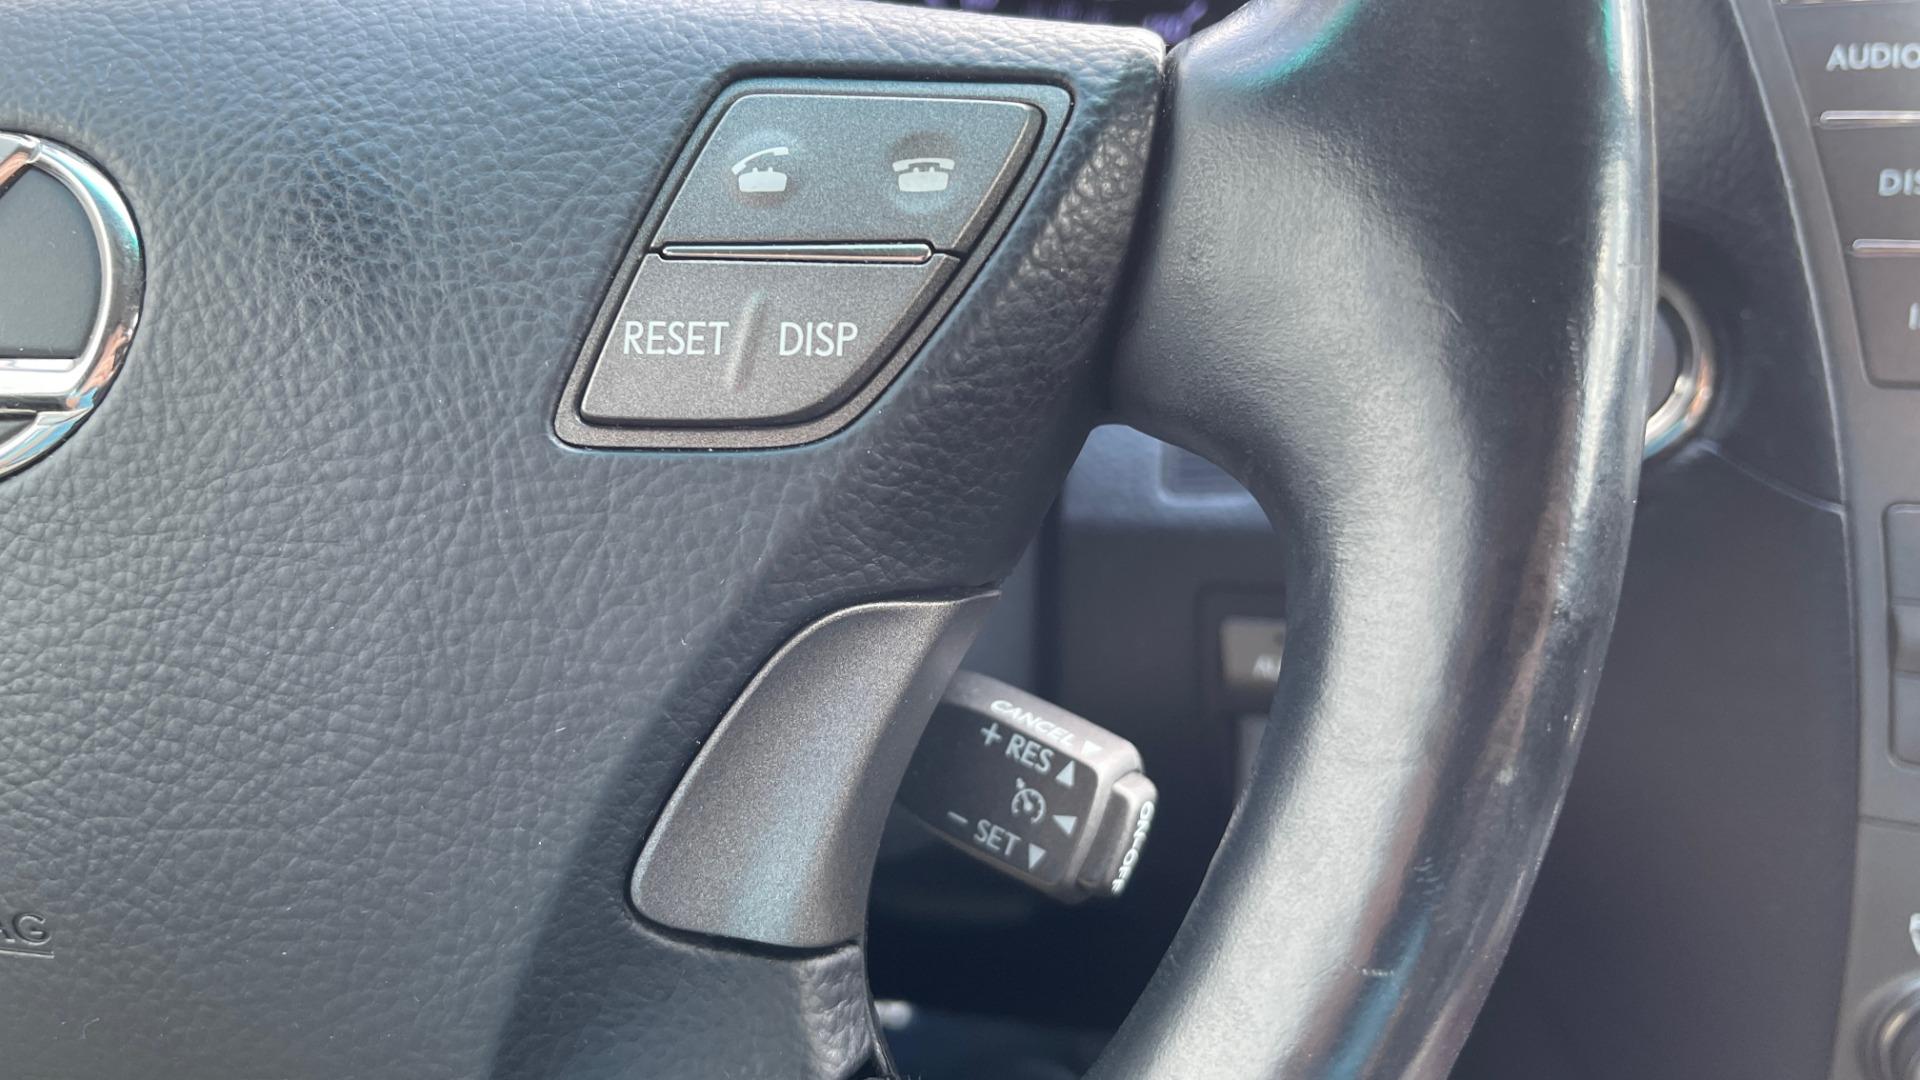 Used 2007 Lexus LS 460 SEDAN / COMFORT PKG / NAVIGATION / MARK LEVINSON / REARVIEW for sale $14,995 at Formula Imports in Charlotte NC 28227 39